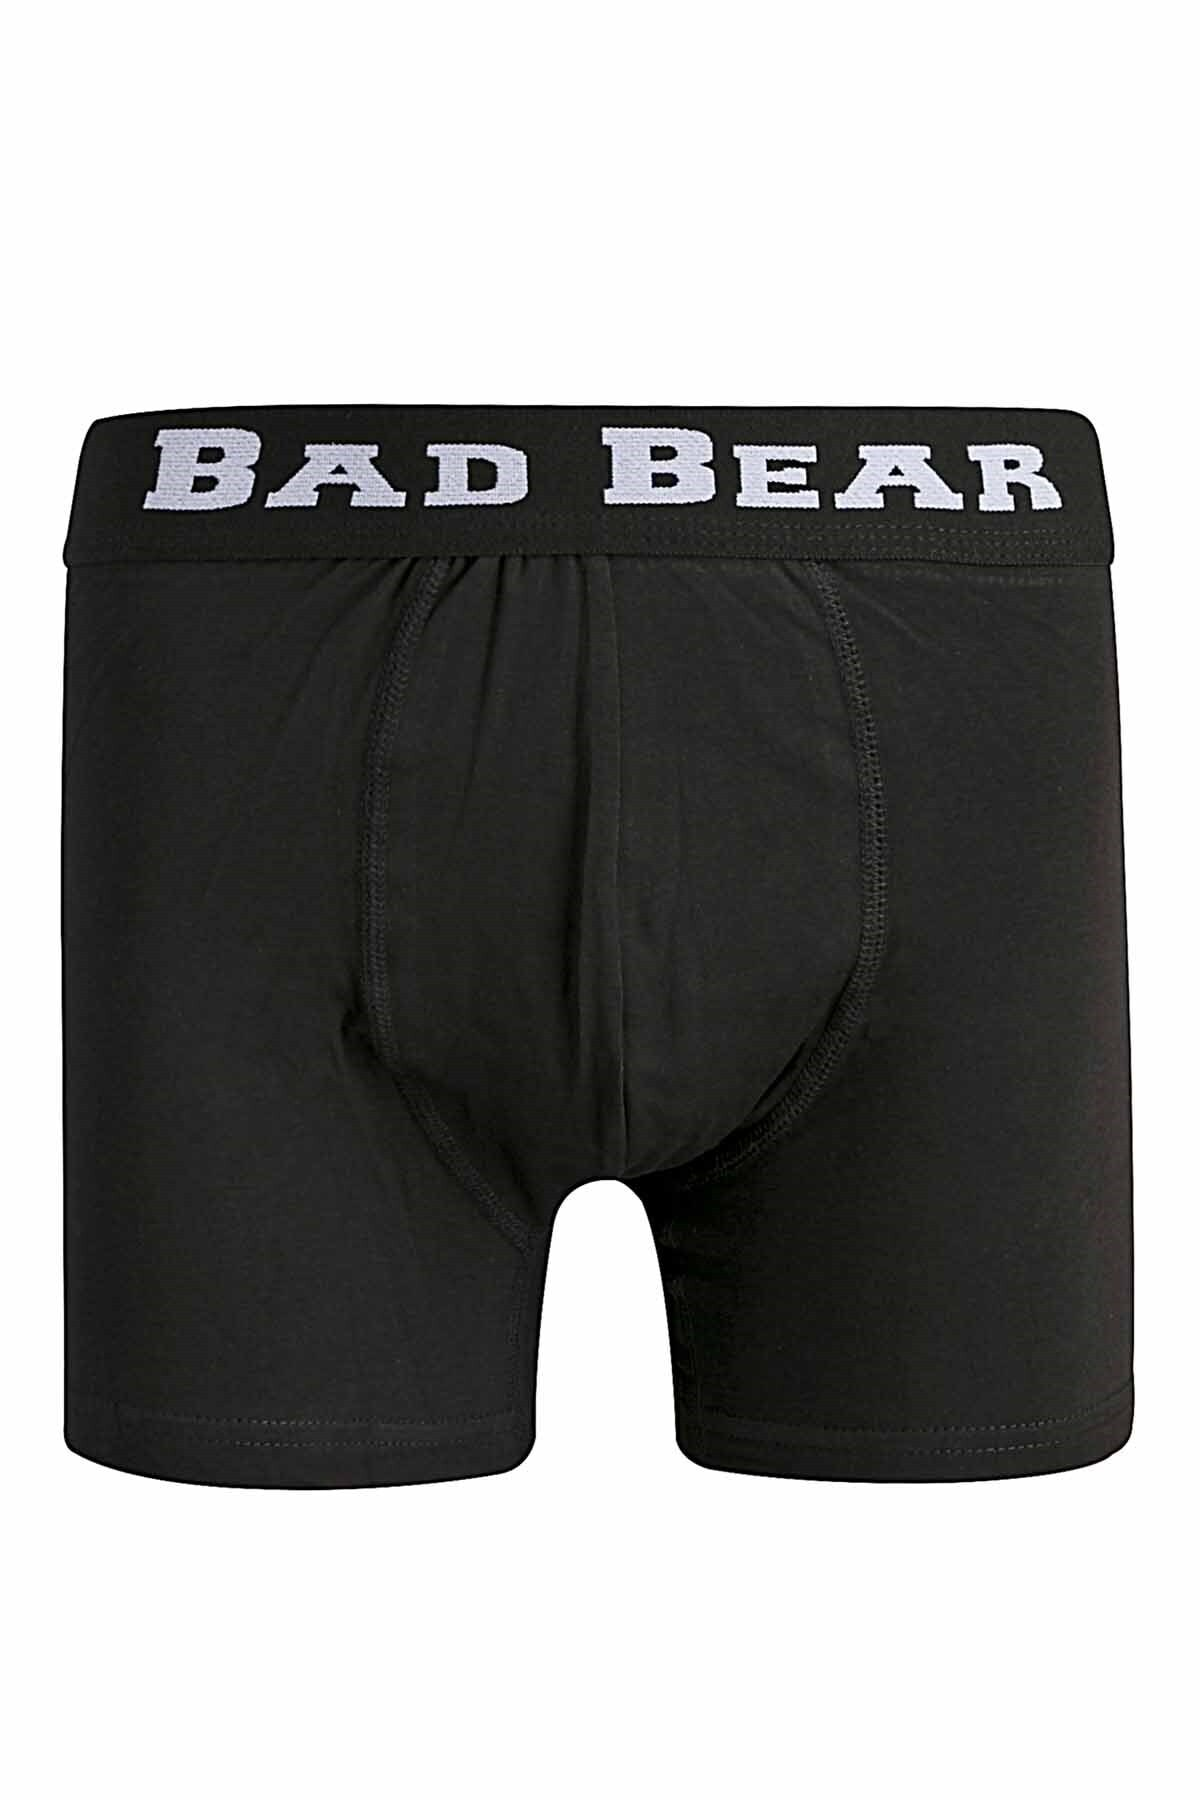 Bad Bear Solıd Uw Erkek Boxer 18.01.03.019nıght 1